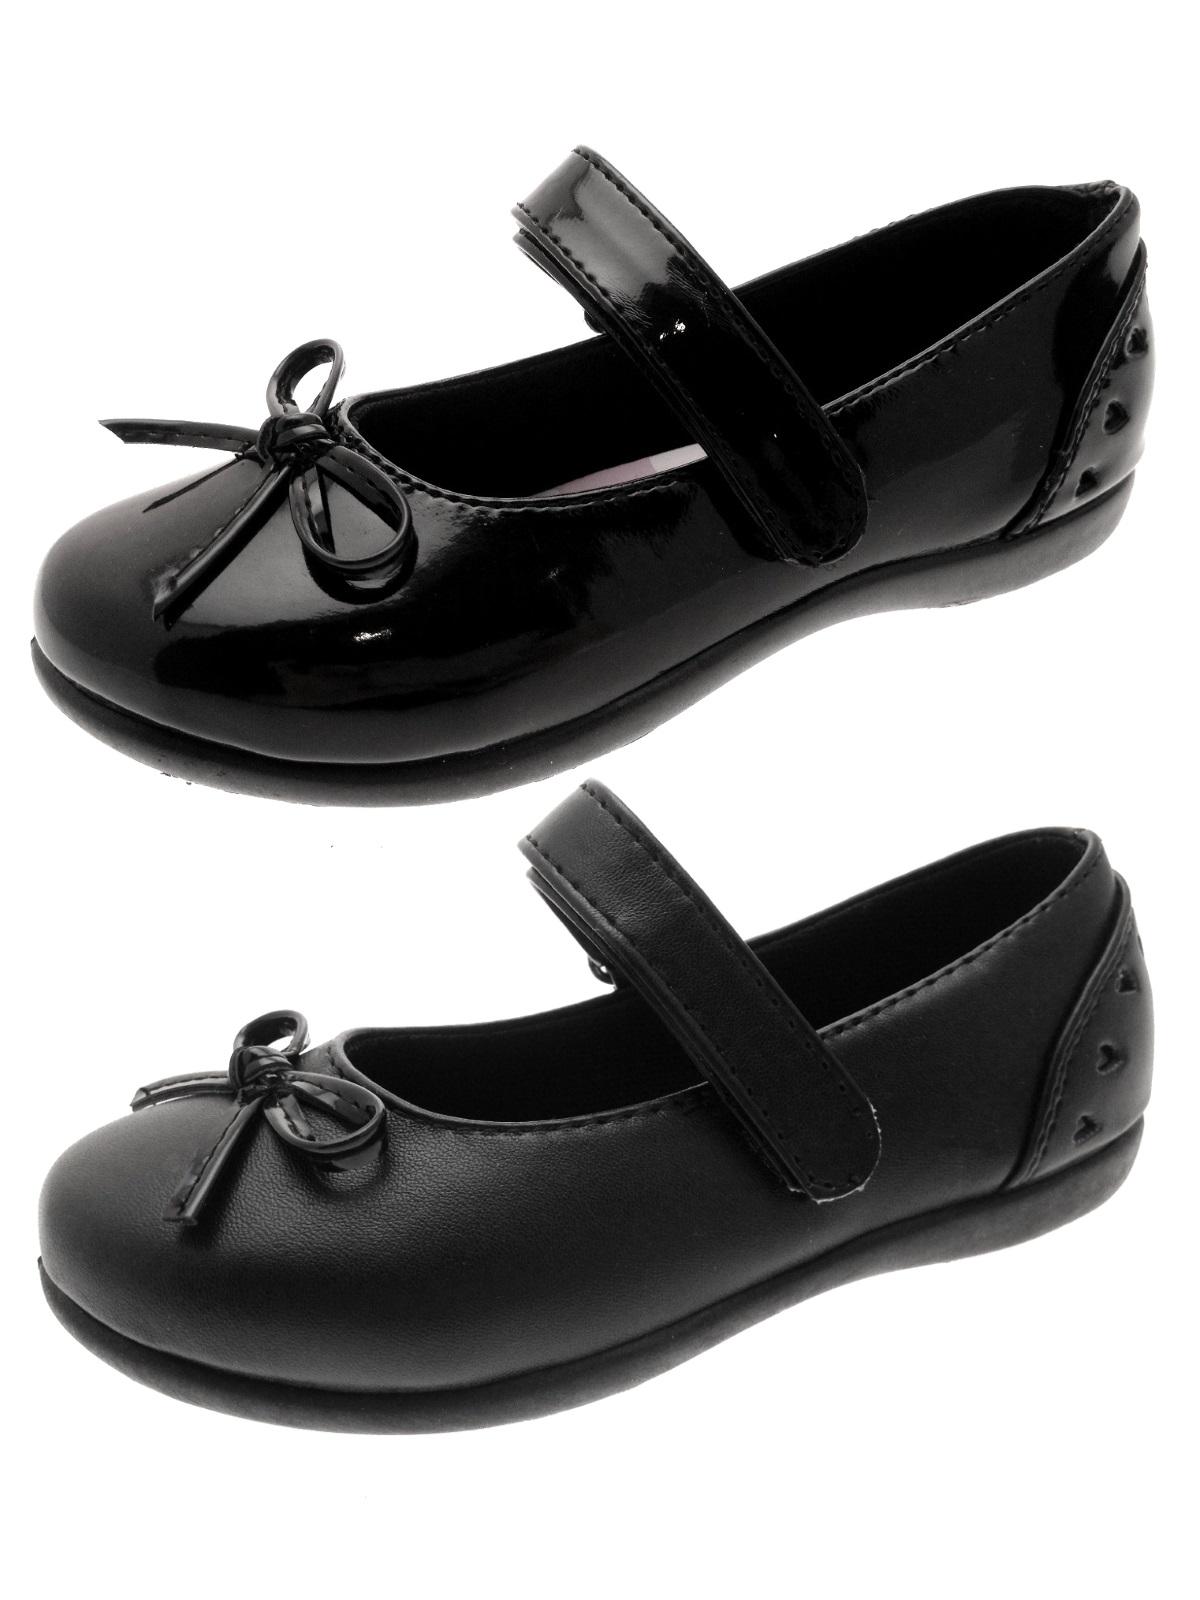 Girls Black School Shoes Faux Leather